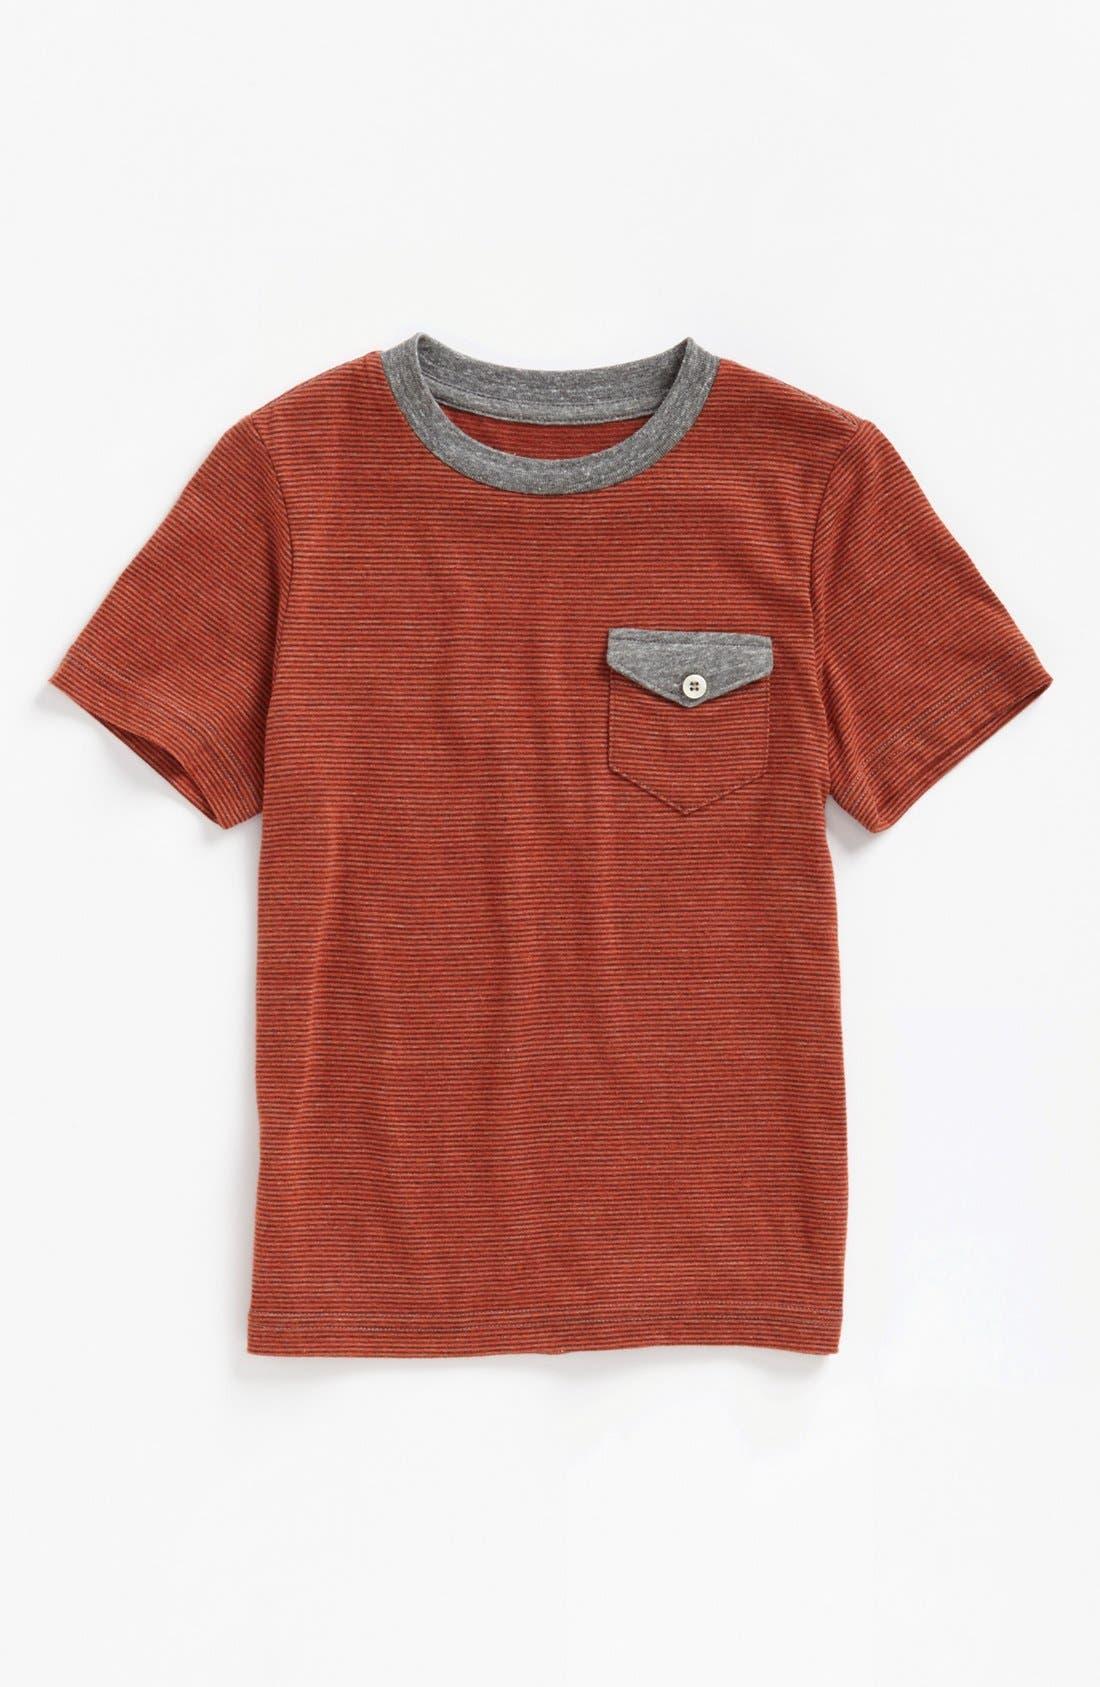 Alternate Image 1 Selected - Tucker + Tate 'Bretland' T-Shirt (Little Boys)